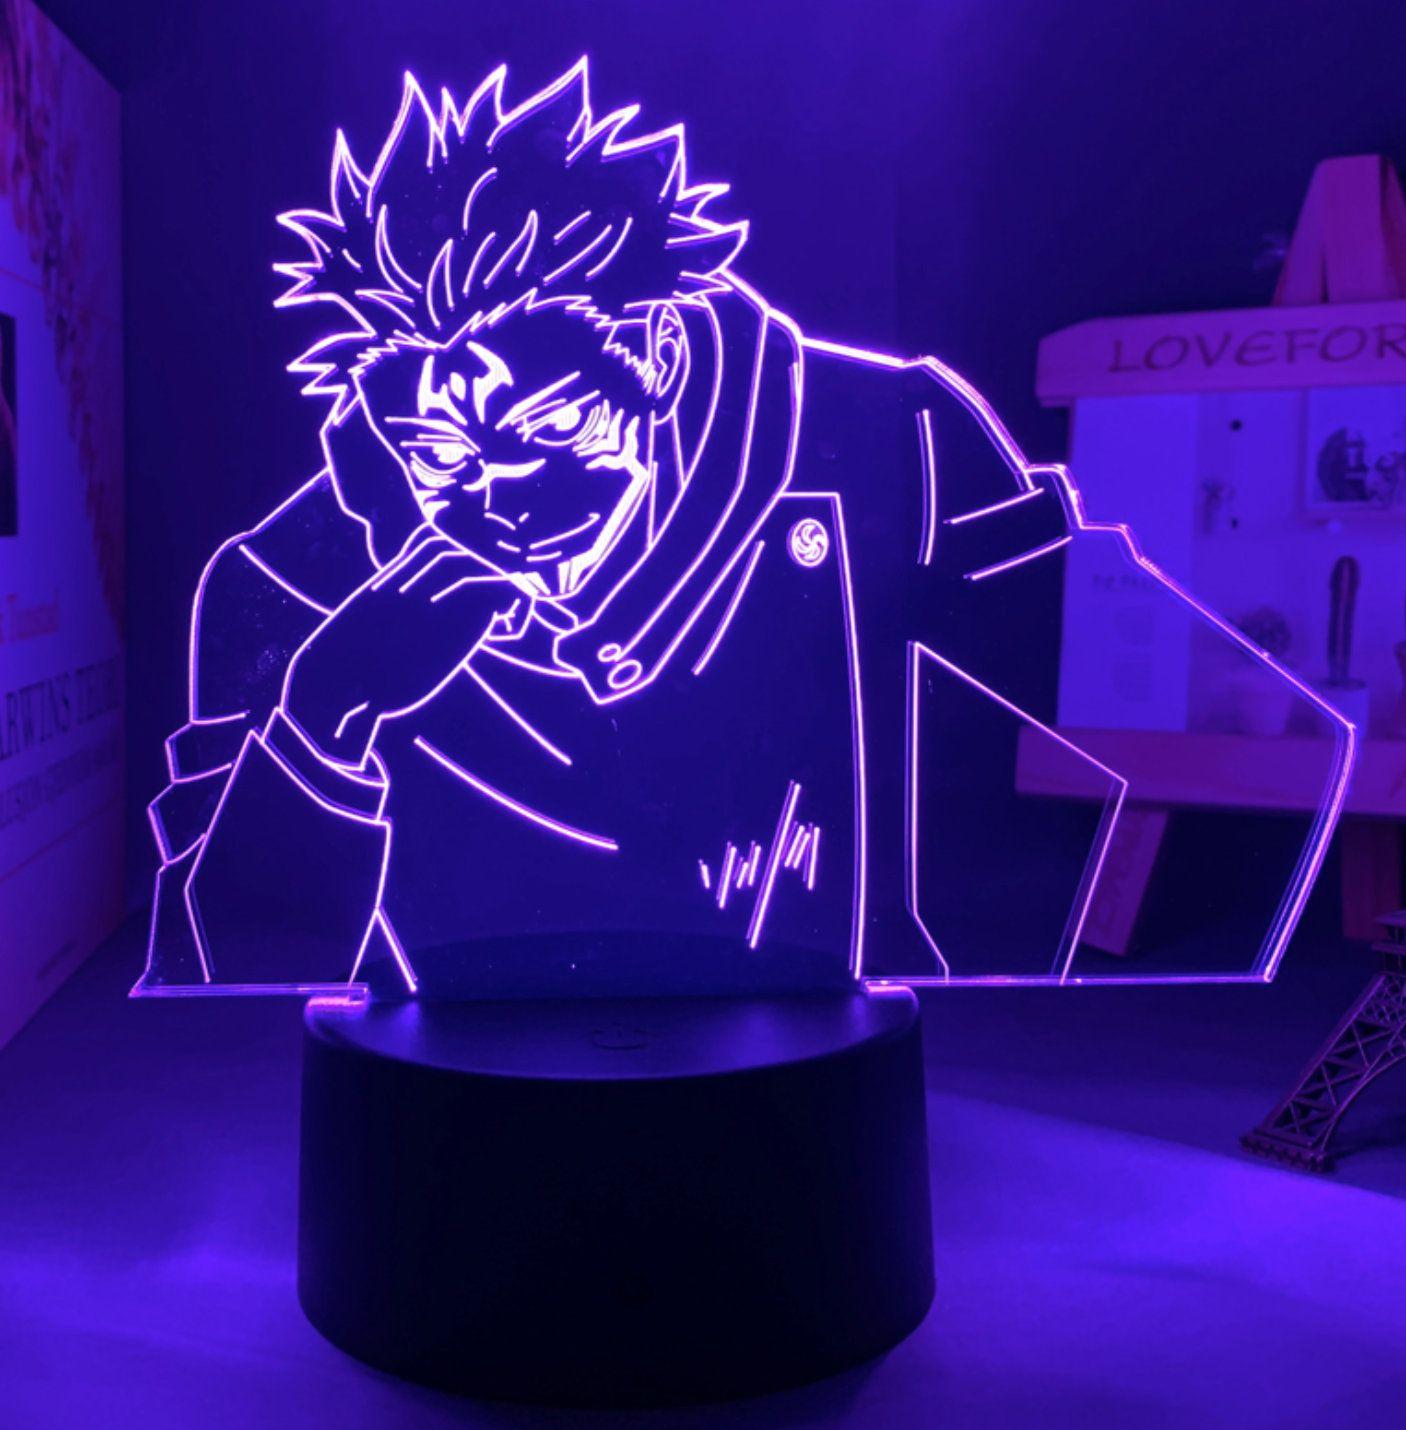 Yuji Itadori Sukuna Form From Anime Jujutsu Kaisen Led Lamp Etsy In 2021 Anime Decor Gifts Jujutsu